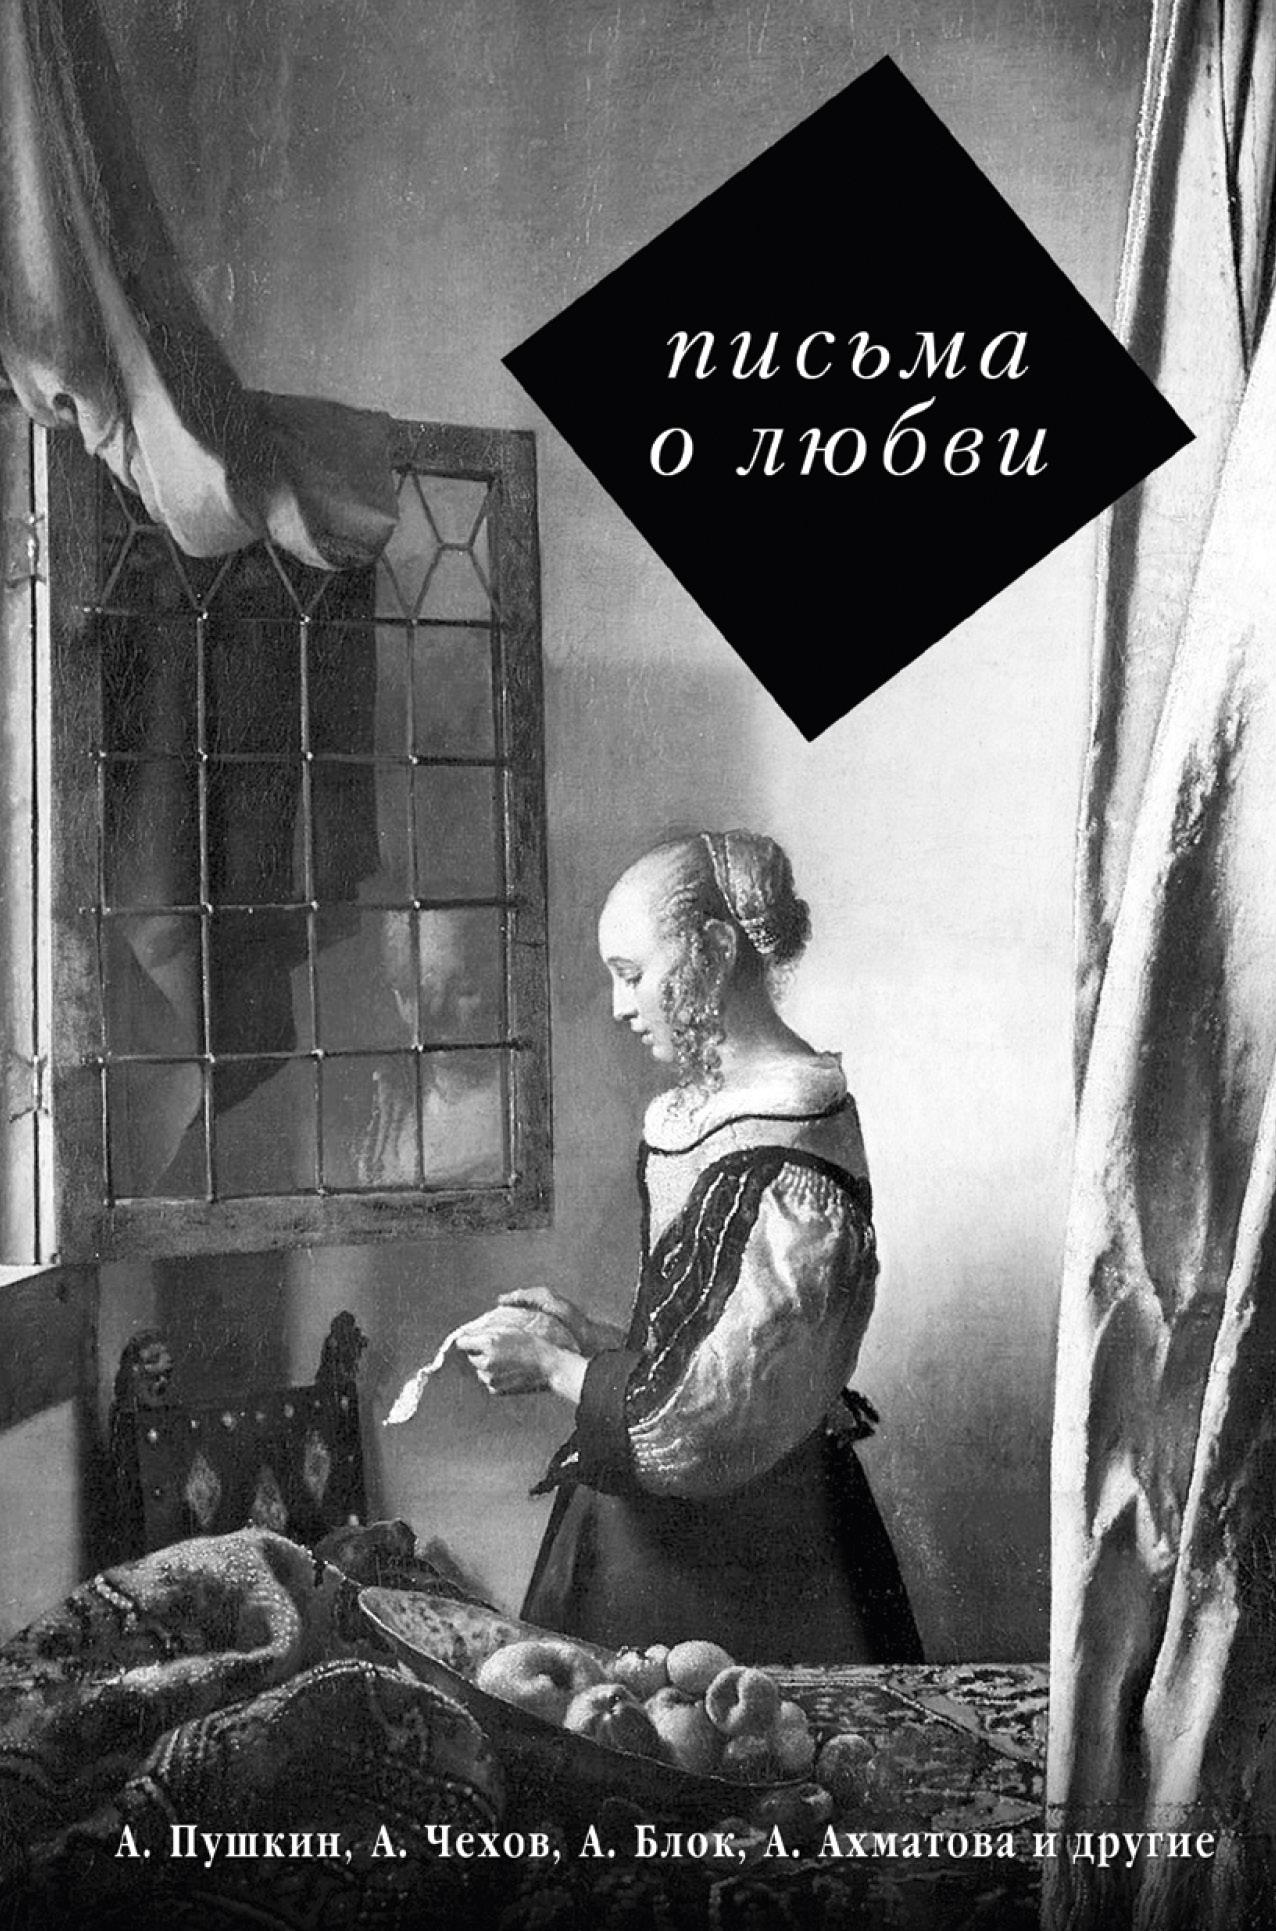 Чехов А.П., Ахматова А.А. Письма о любви